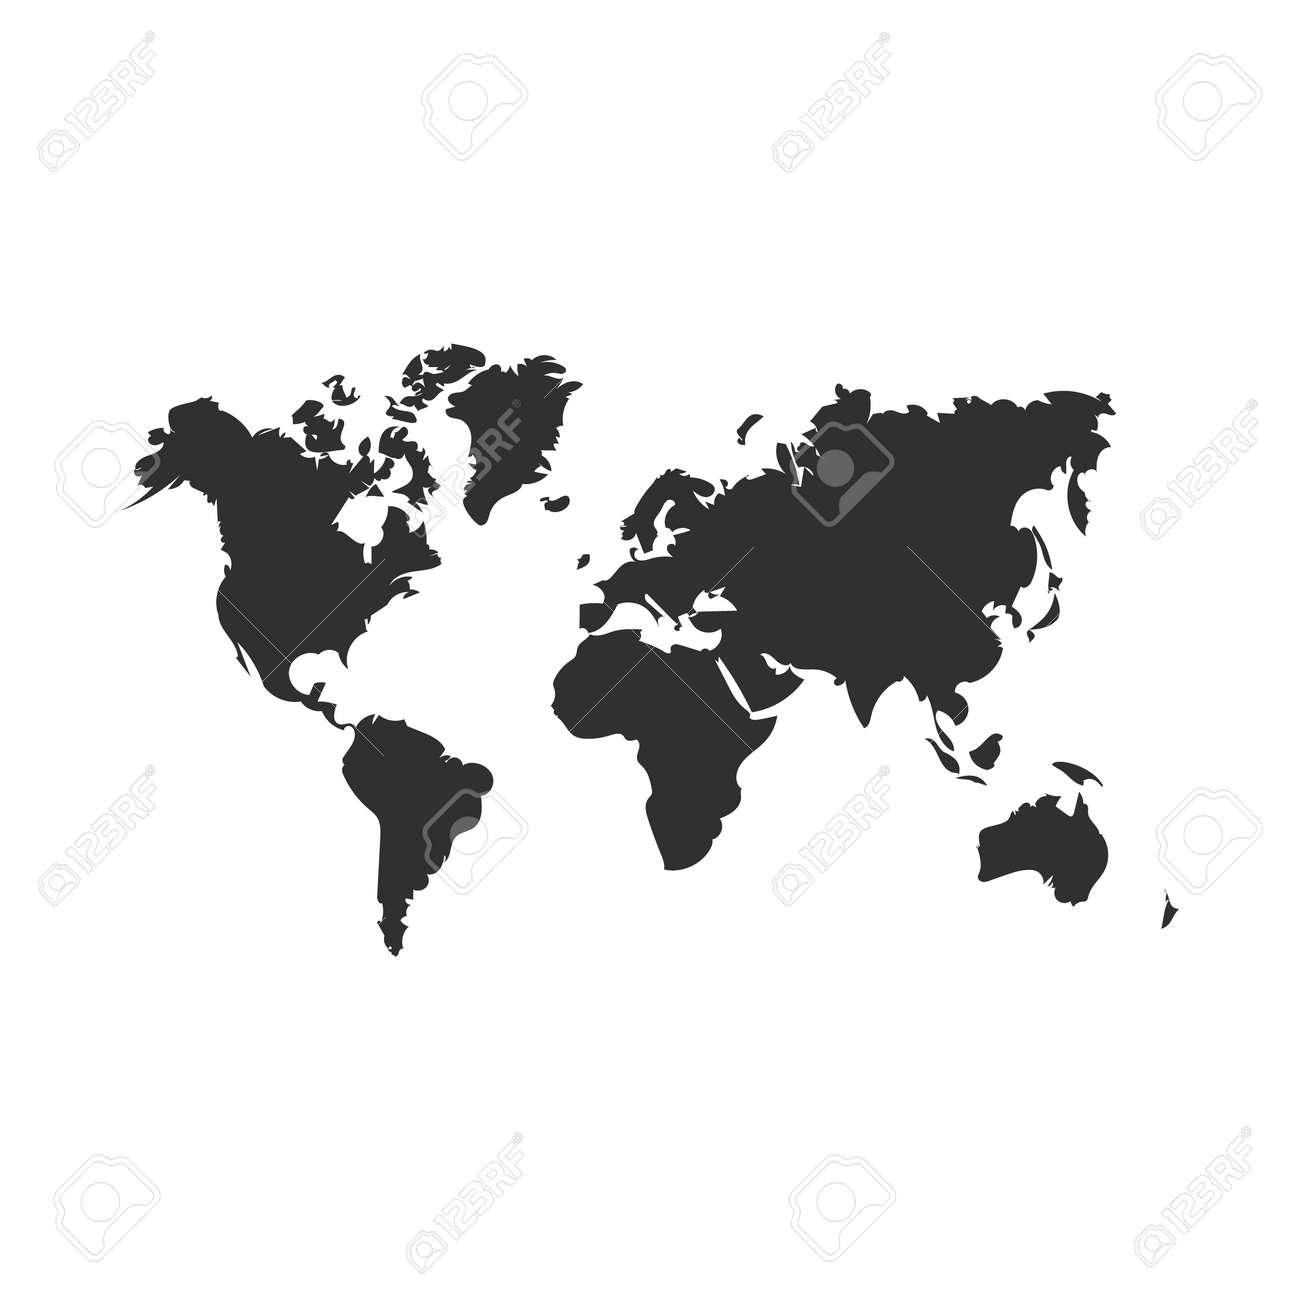 world map map icon. isolated on white background. Vector illustration. Eps 10 - 122628780